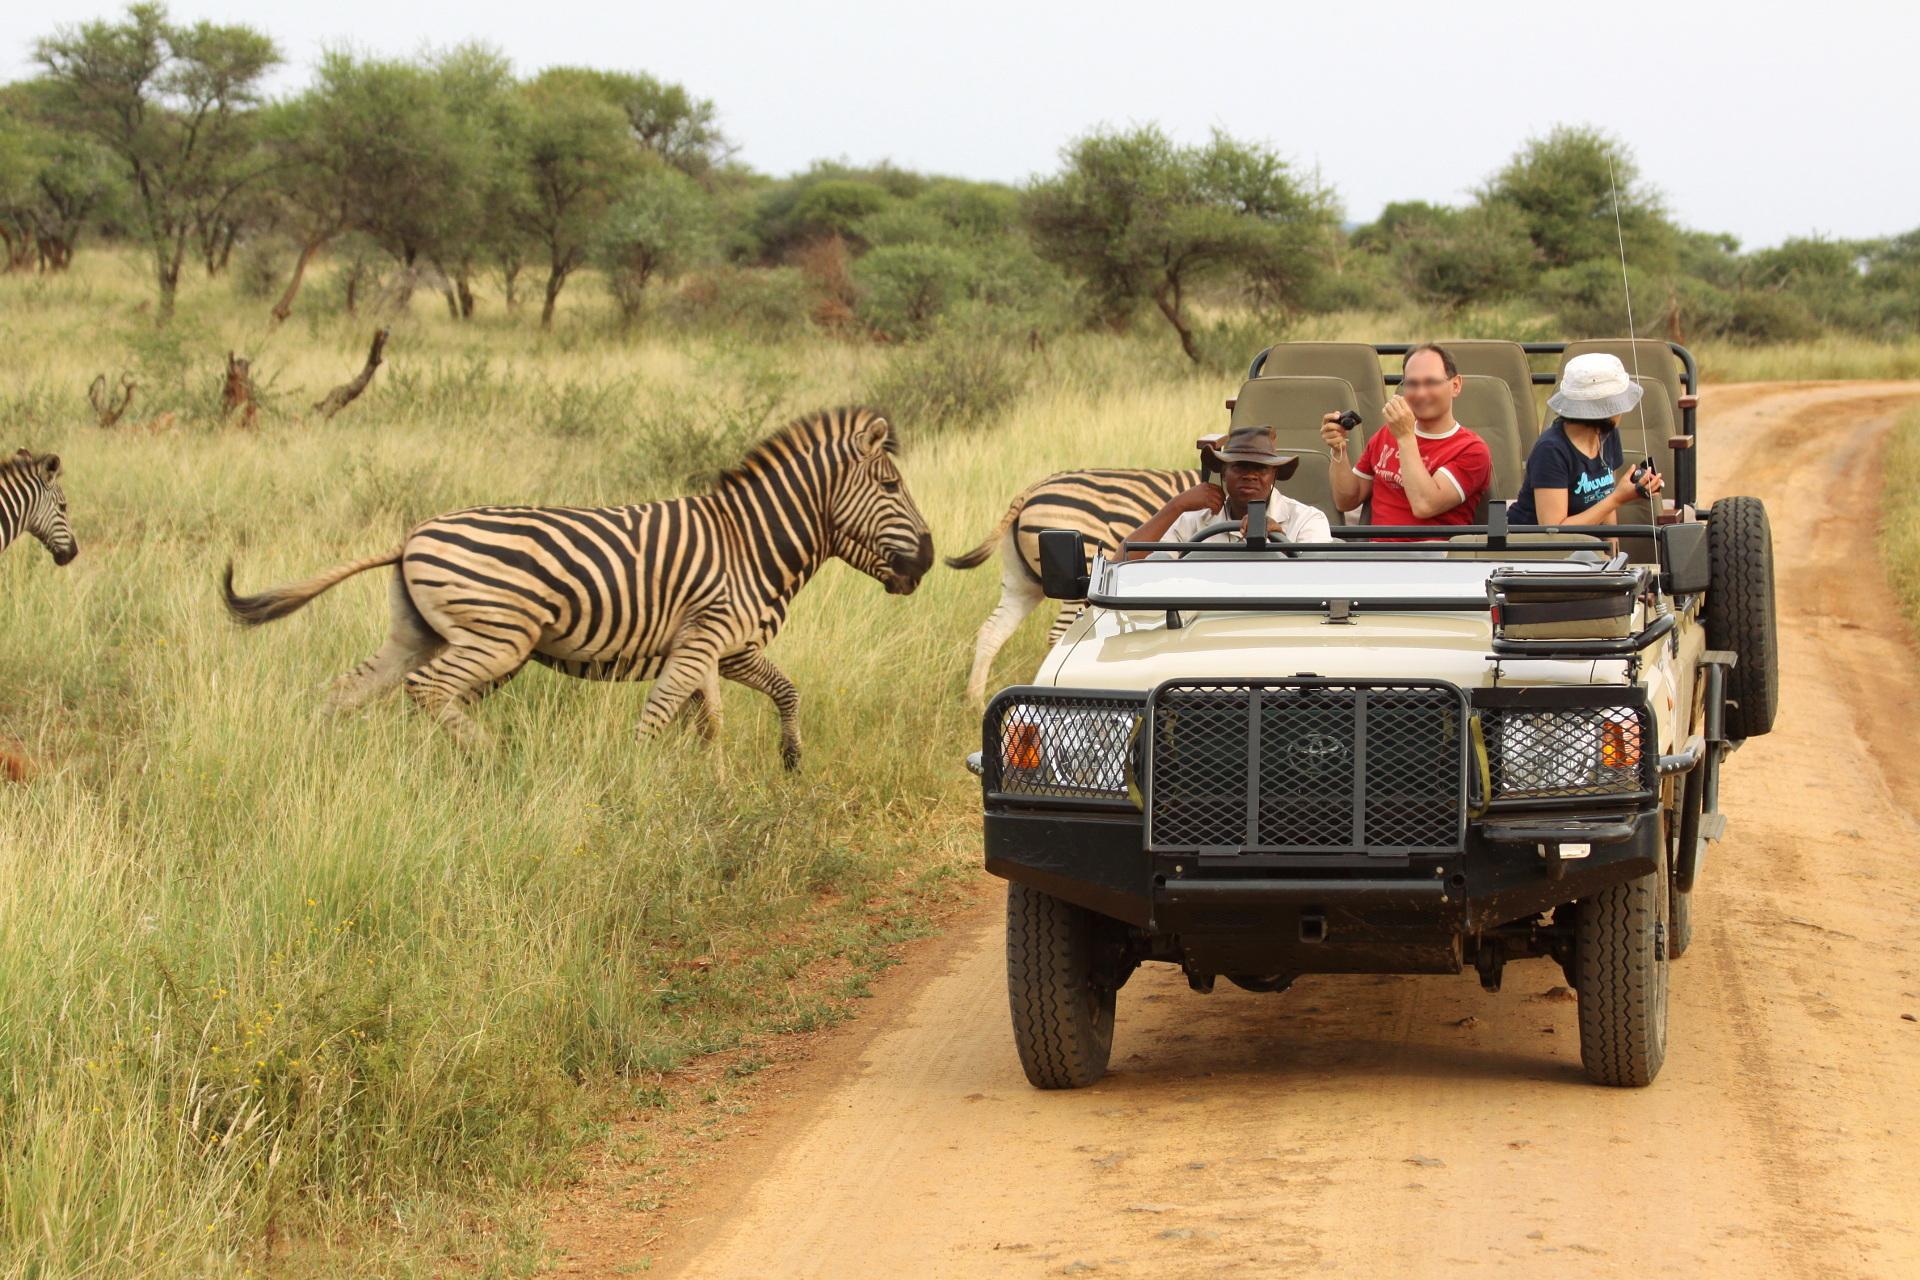 Comparing Safaris Before You Buy